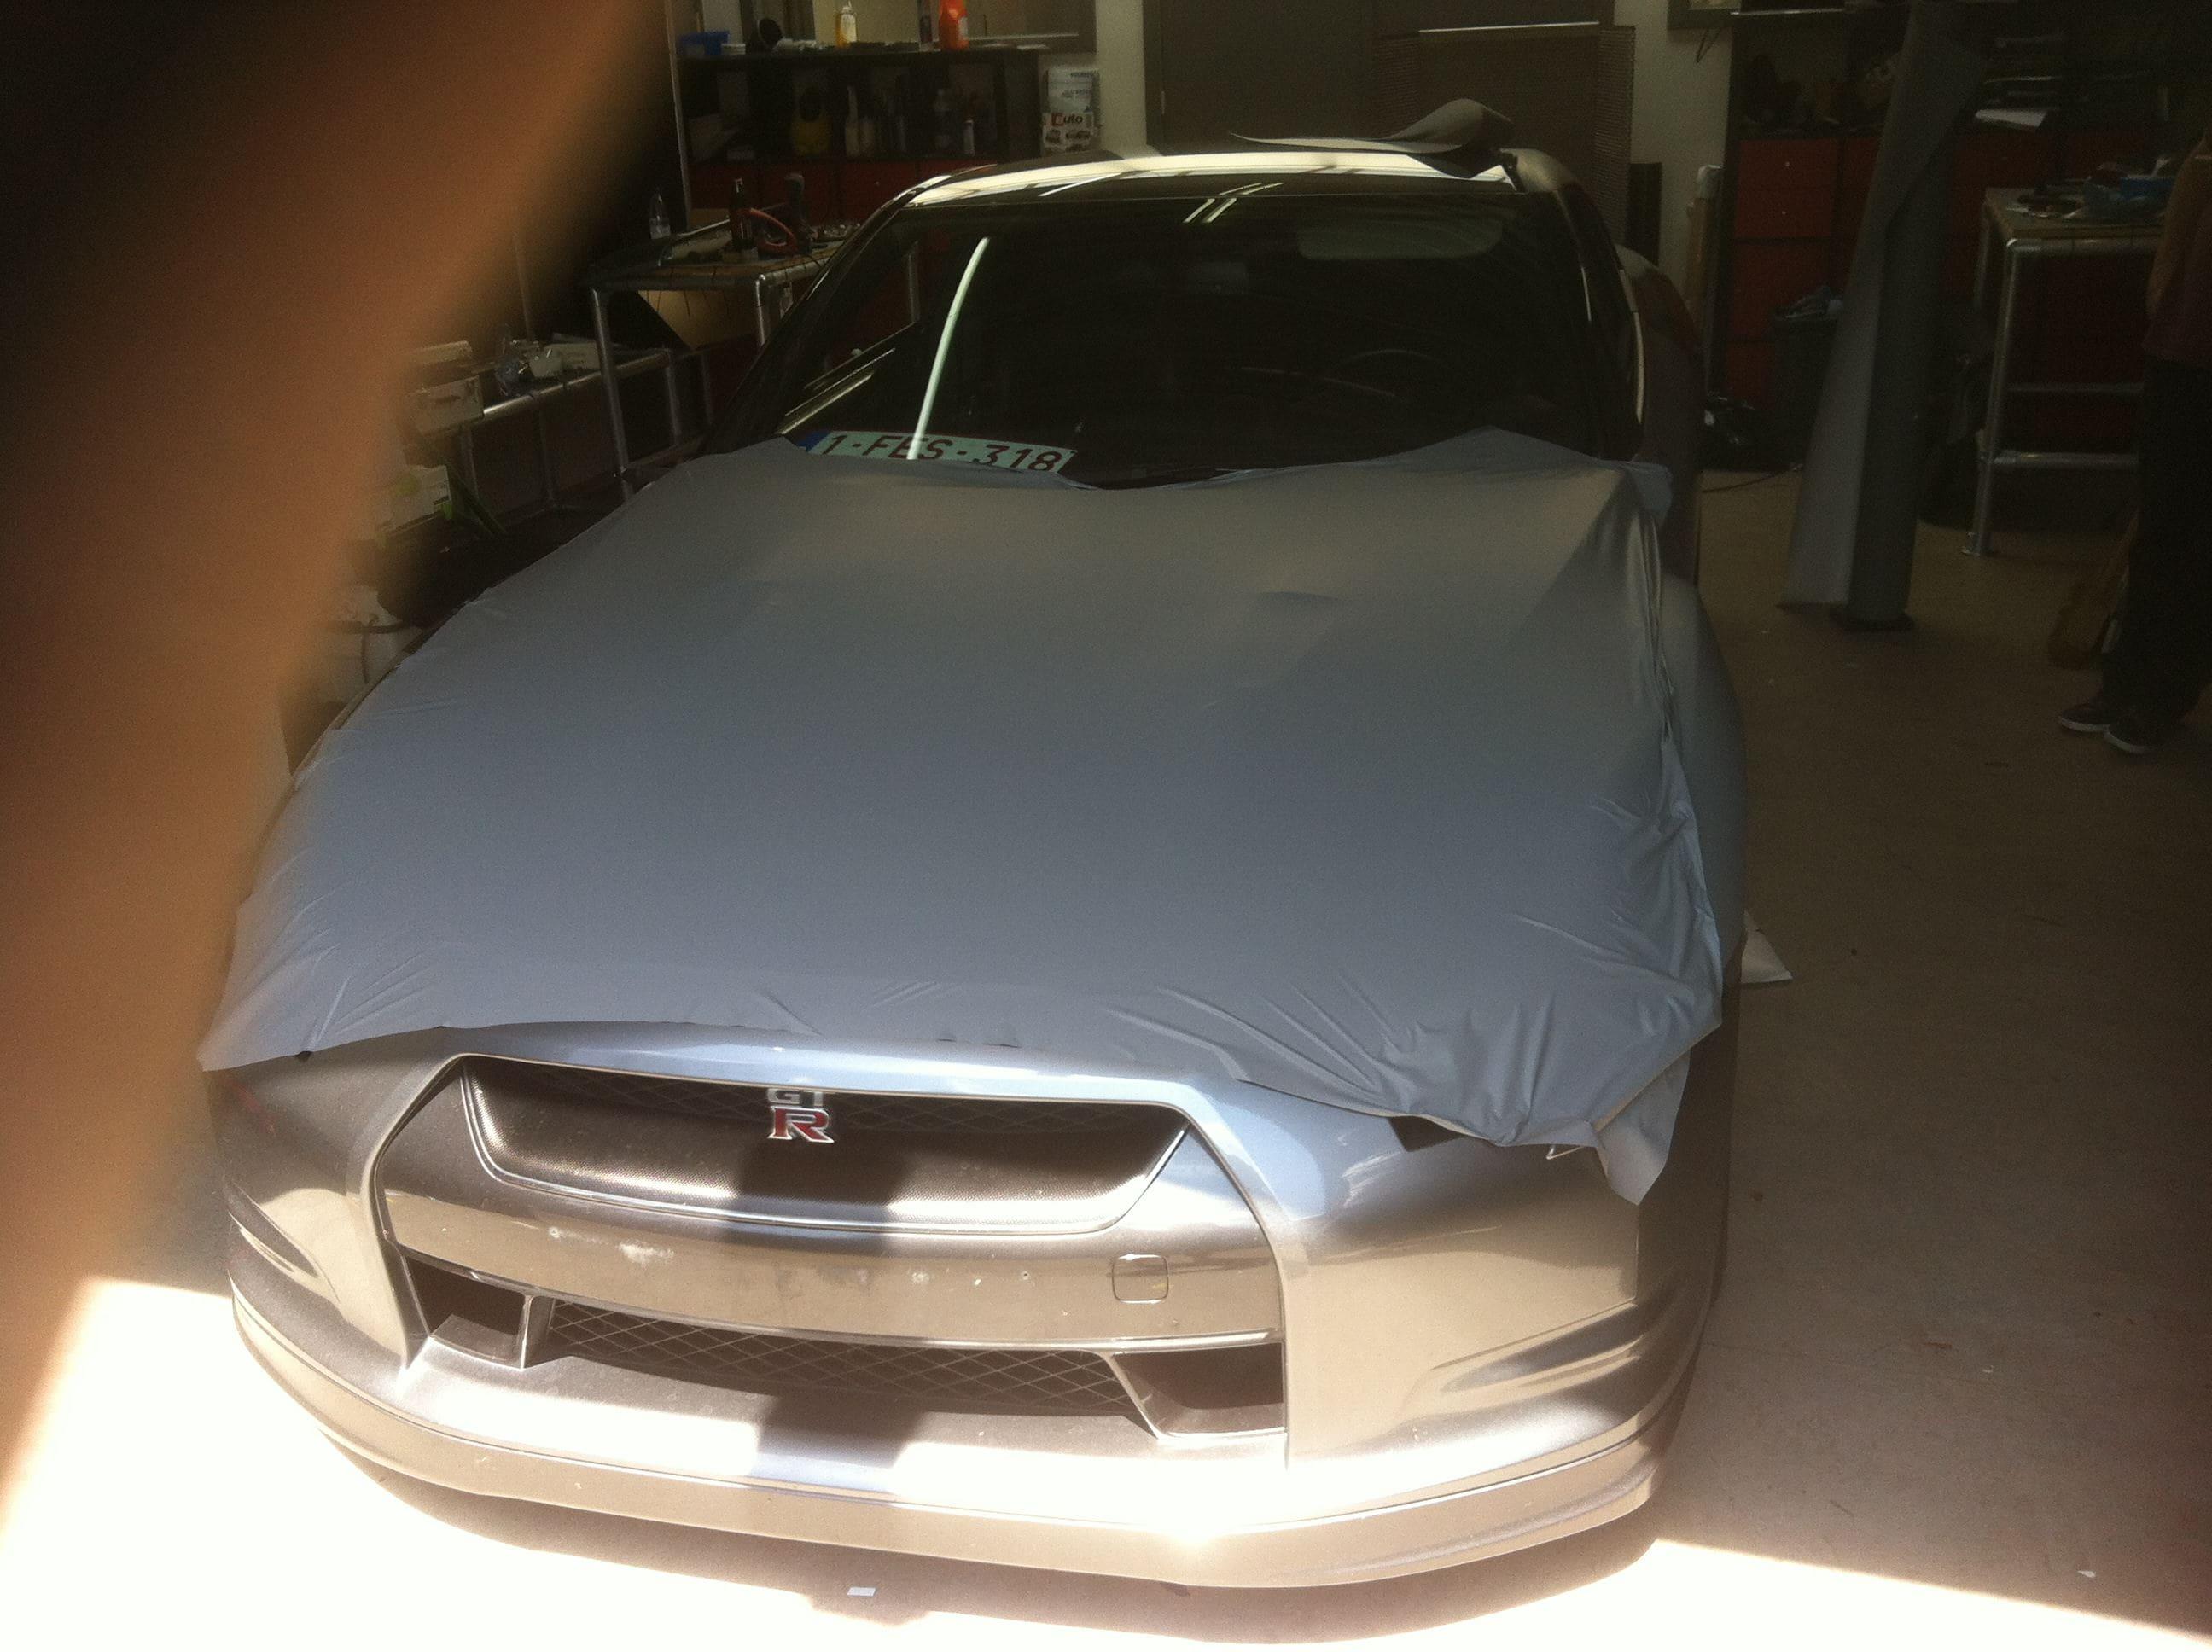 Nissan GT-R met Mat Grijze Wrap, Carwrapping door Wrapmyride.nu Foto-nr:6547, ©2021